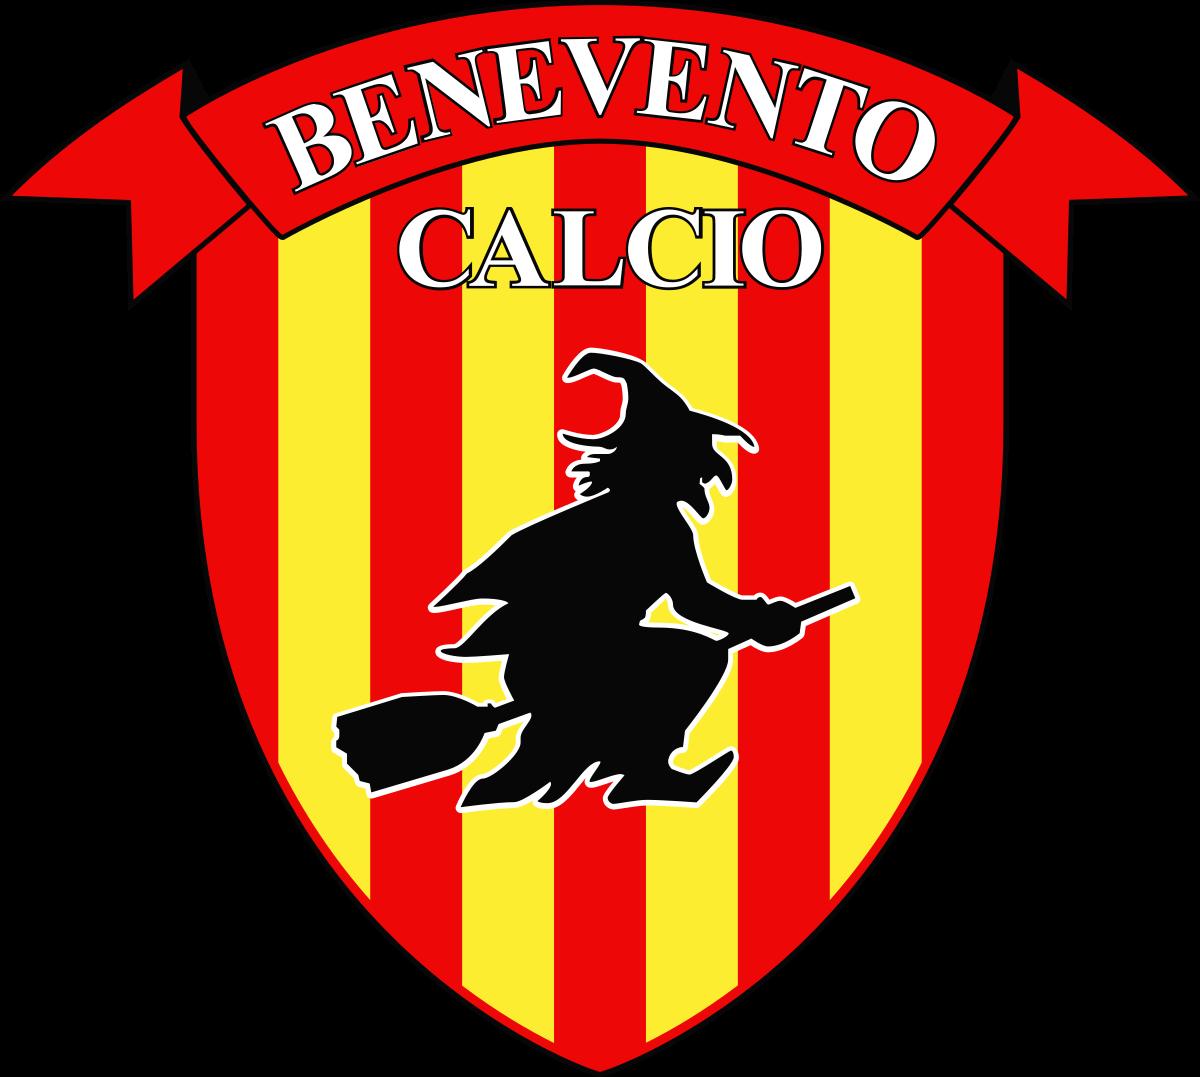 Benevento Calendario.Benevento Calendario Squadra Italia Serie B Girone Unico